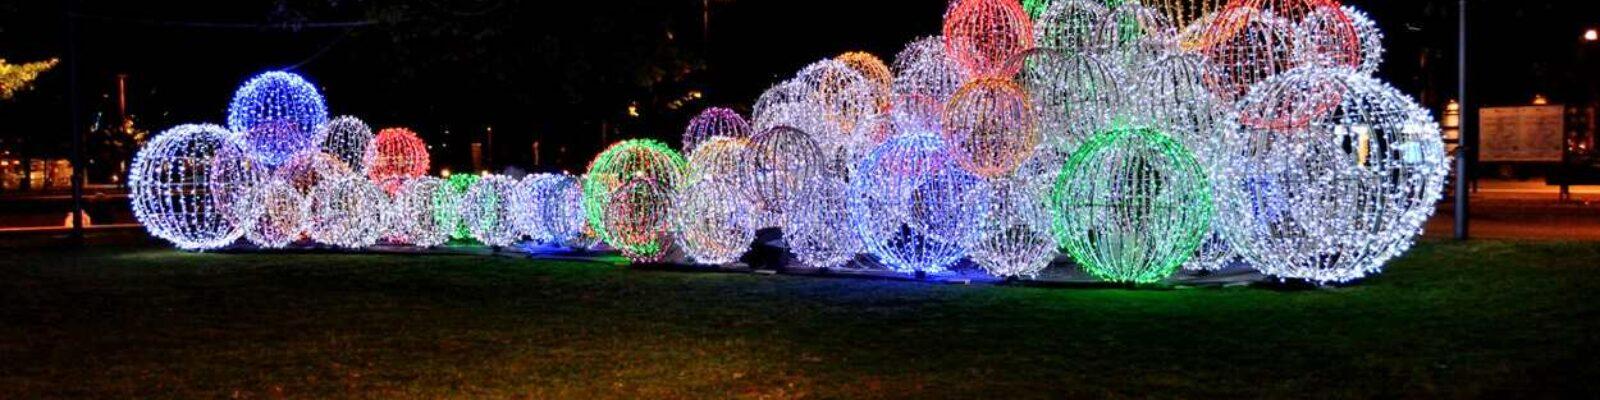 Italy Bergamo Routes EXPO 2015 - led light design